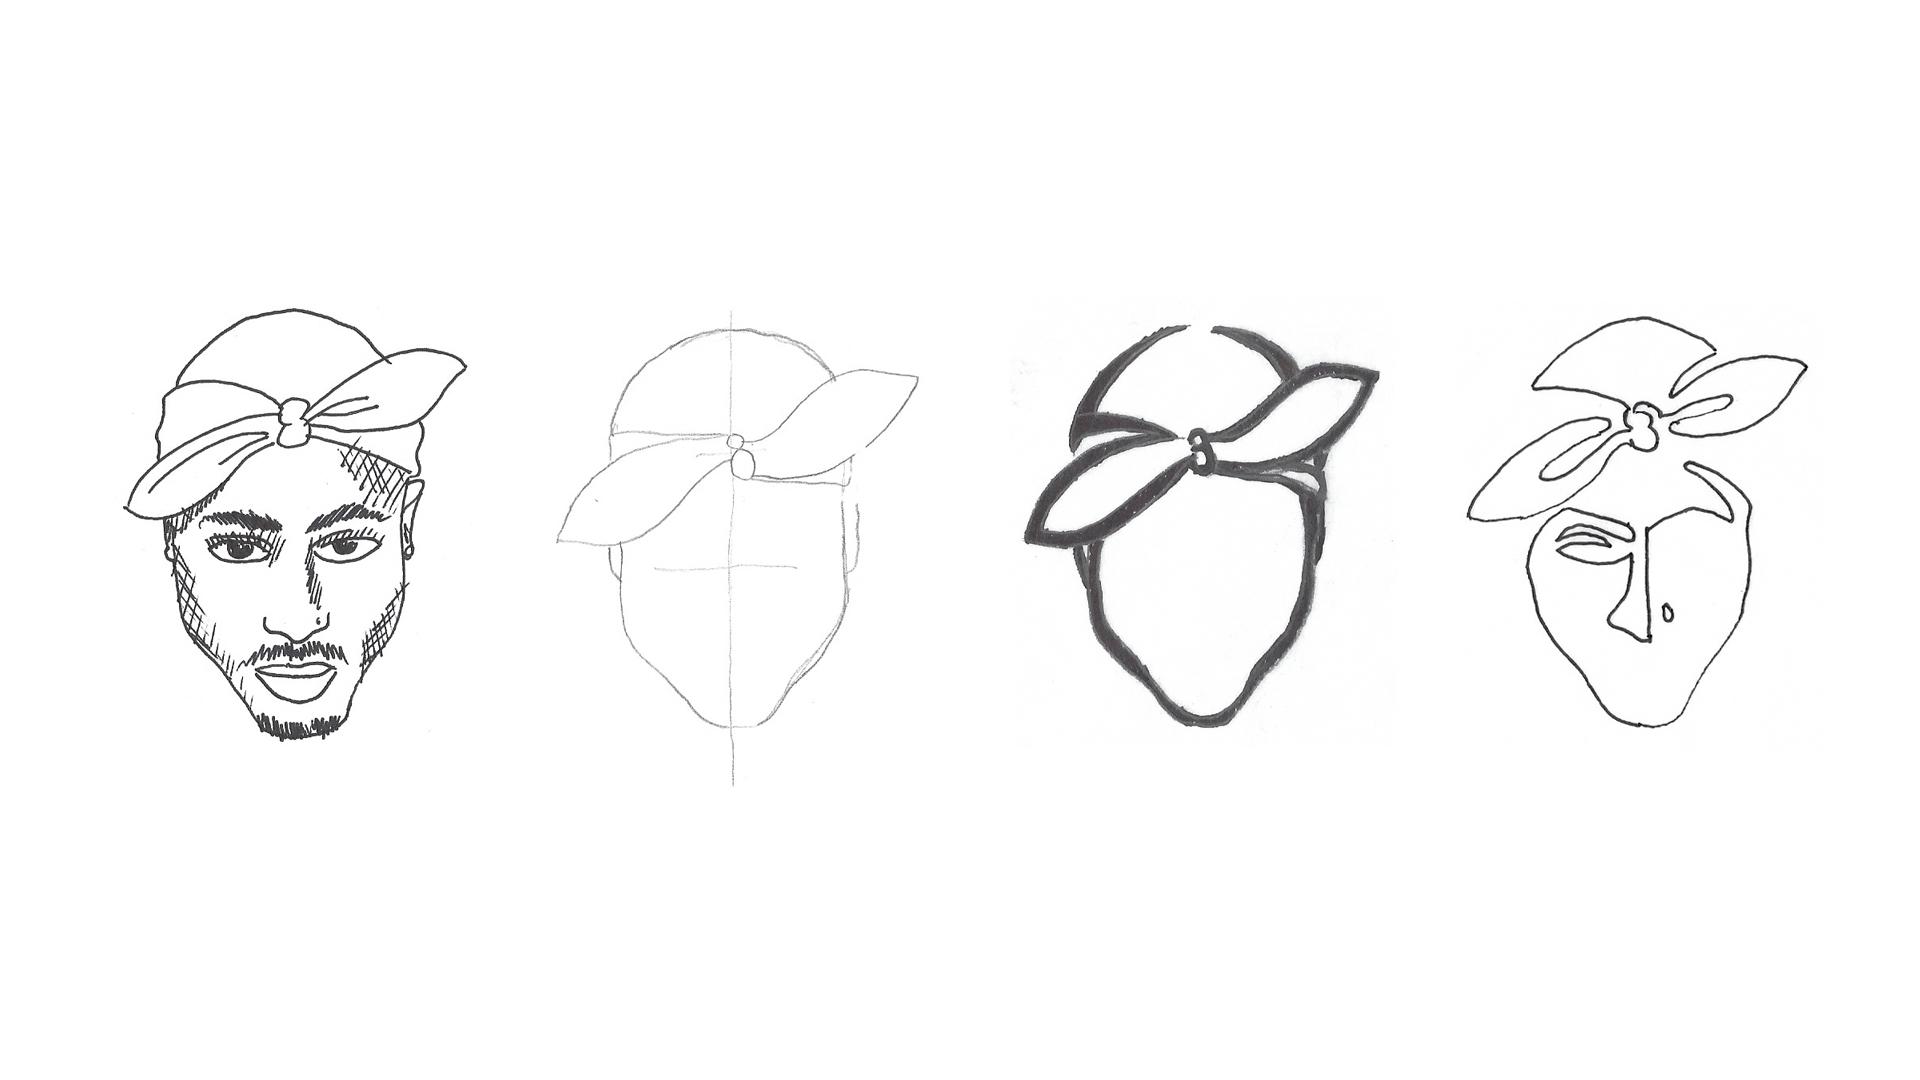 sketch_evolution_of_Tupac_logo.jpg